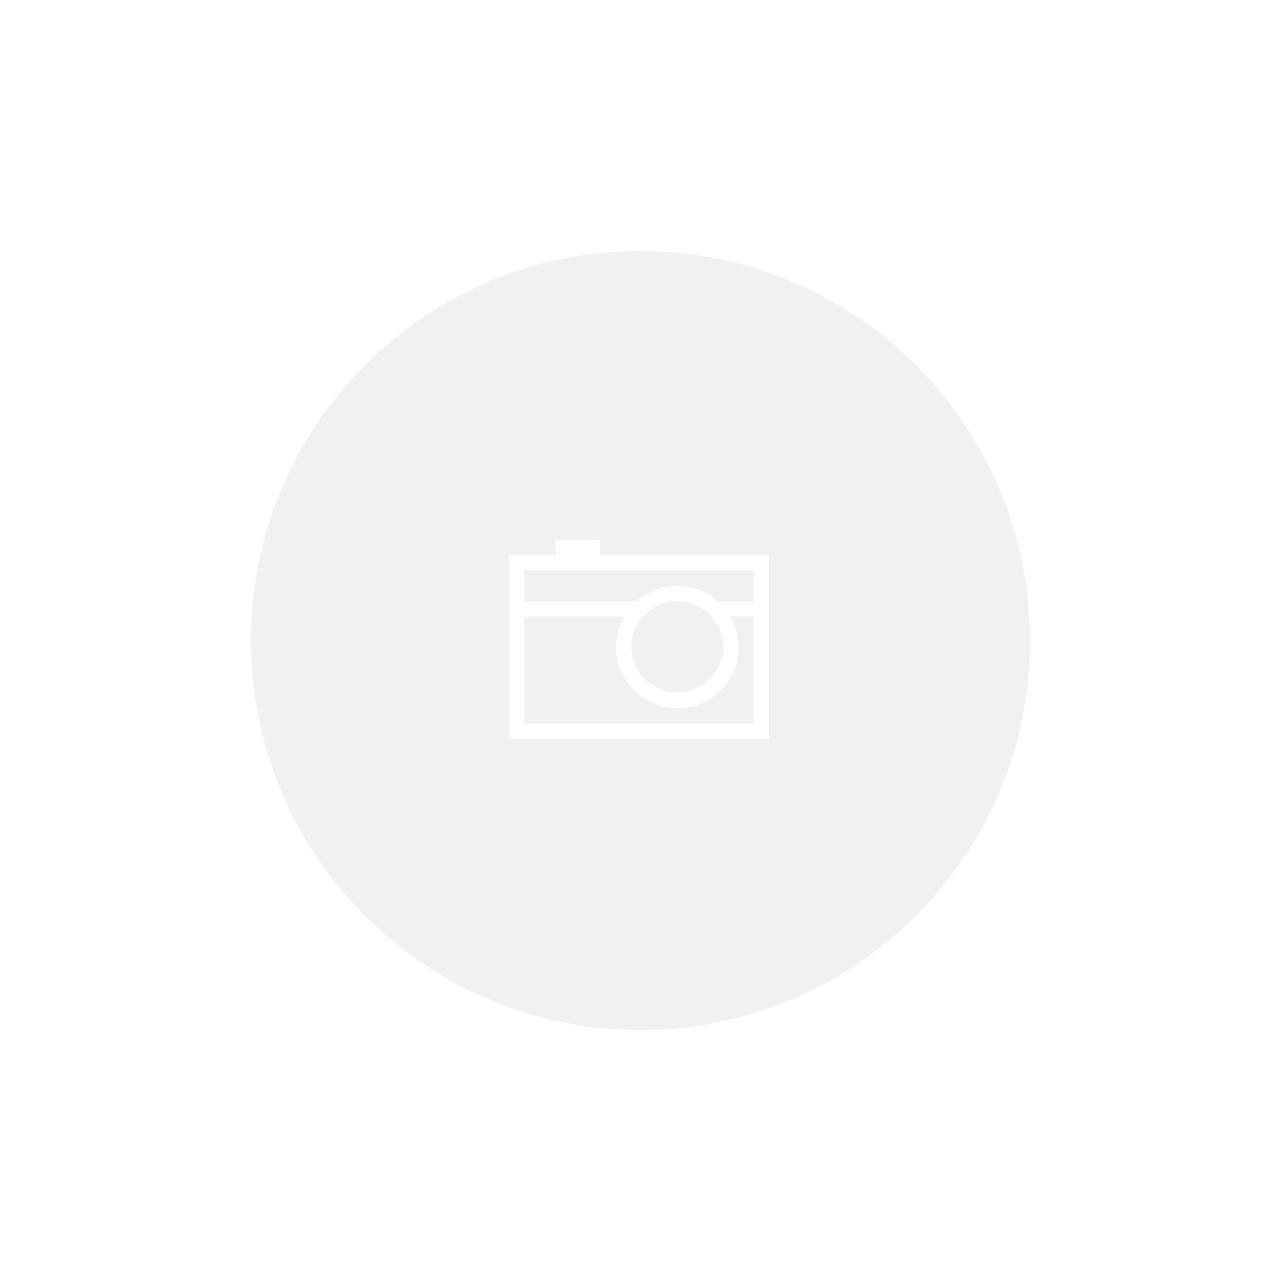 Bomboniere de Cristal Prima Luxo 23x24,5cm